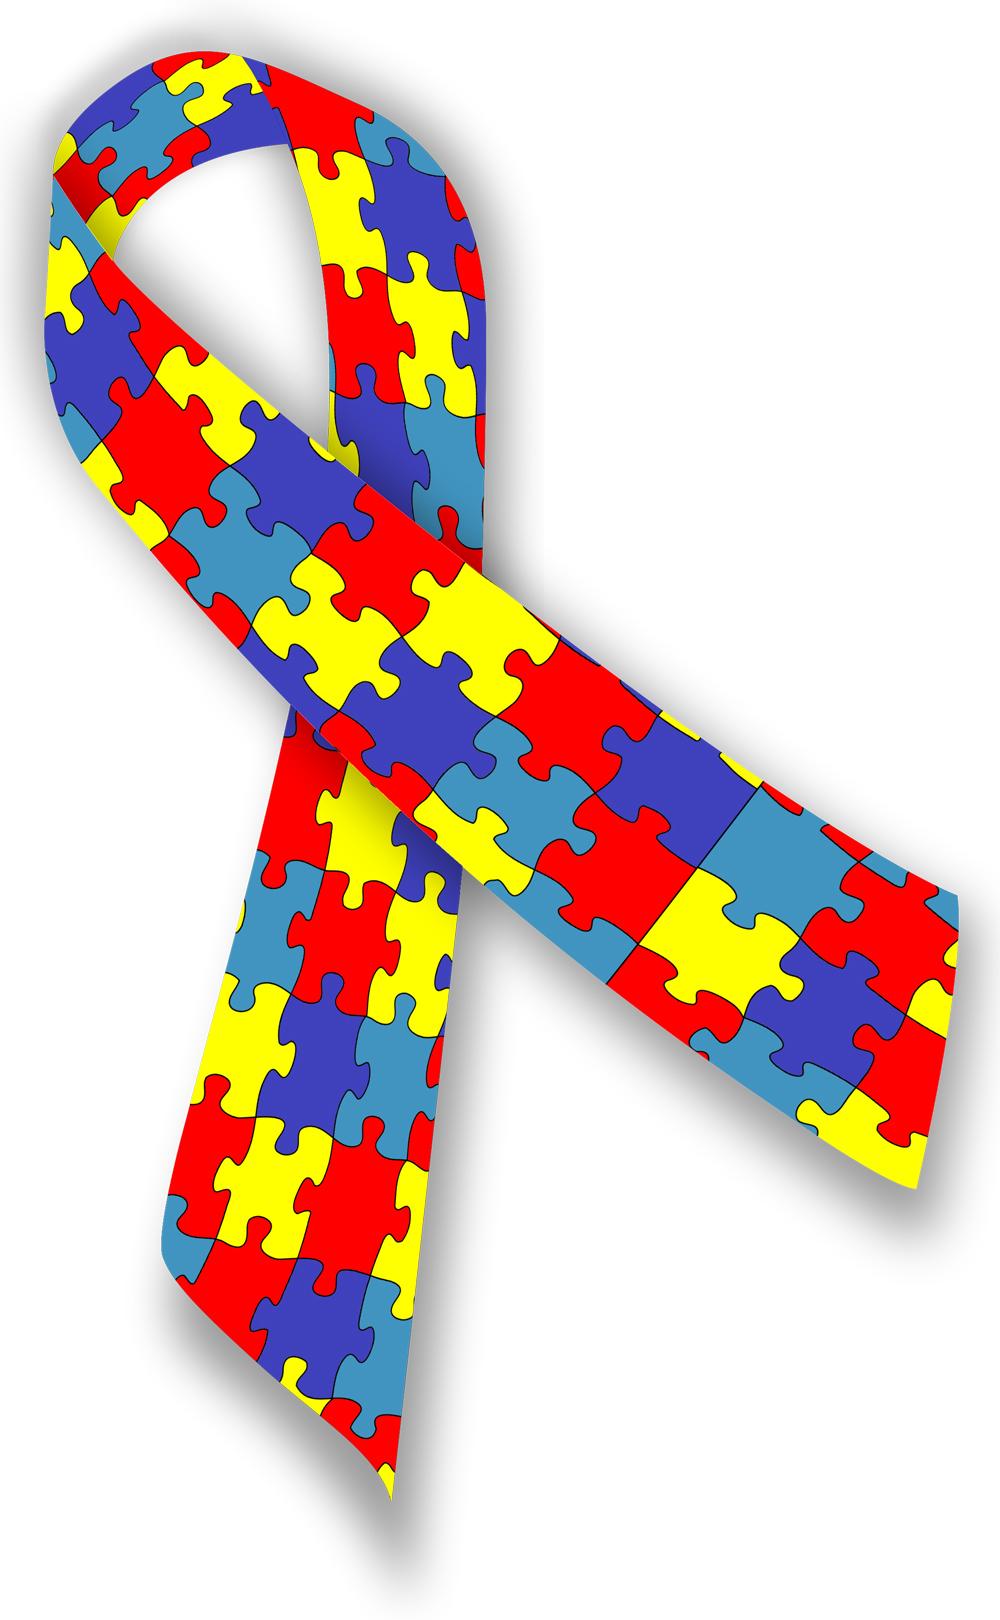 Autor/a: White_ribbon.svg: MesserWoland; Jigsaw_Puzzle.svg: Psyon; derivative work: Melesse (talk) Fuente: Wikimedia Commons